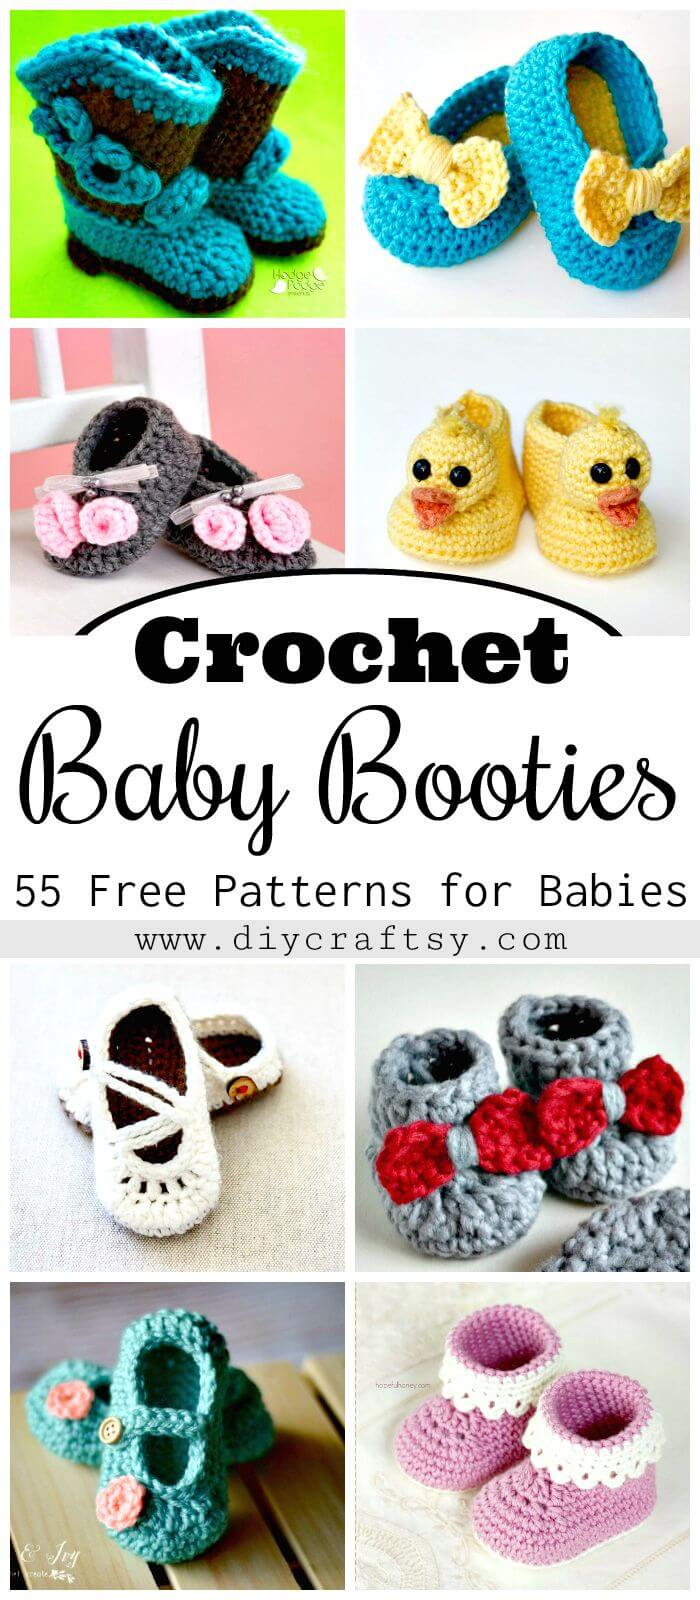 Botitas de crochet para bebé - Patrones de crochet gratis para bebés